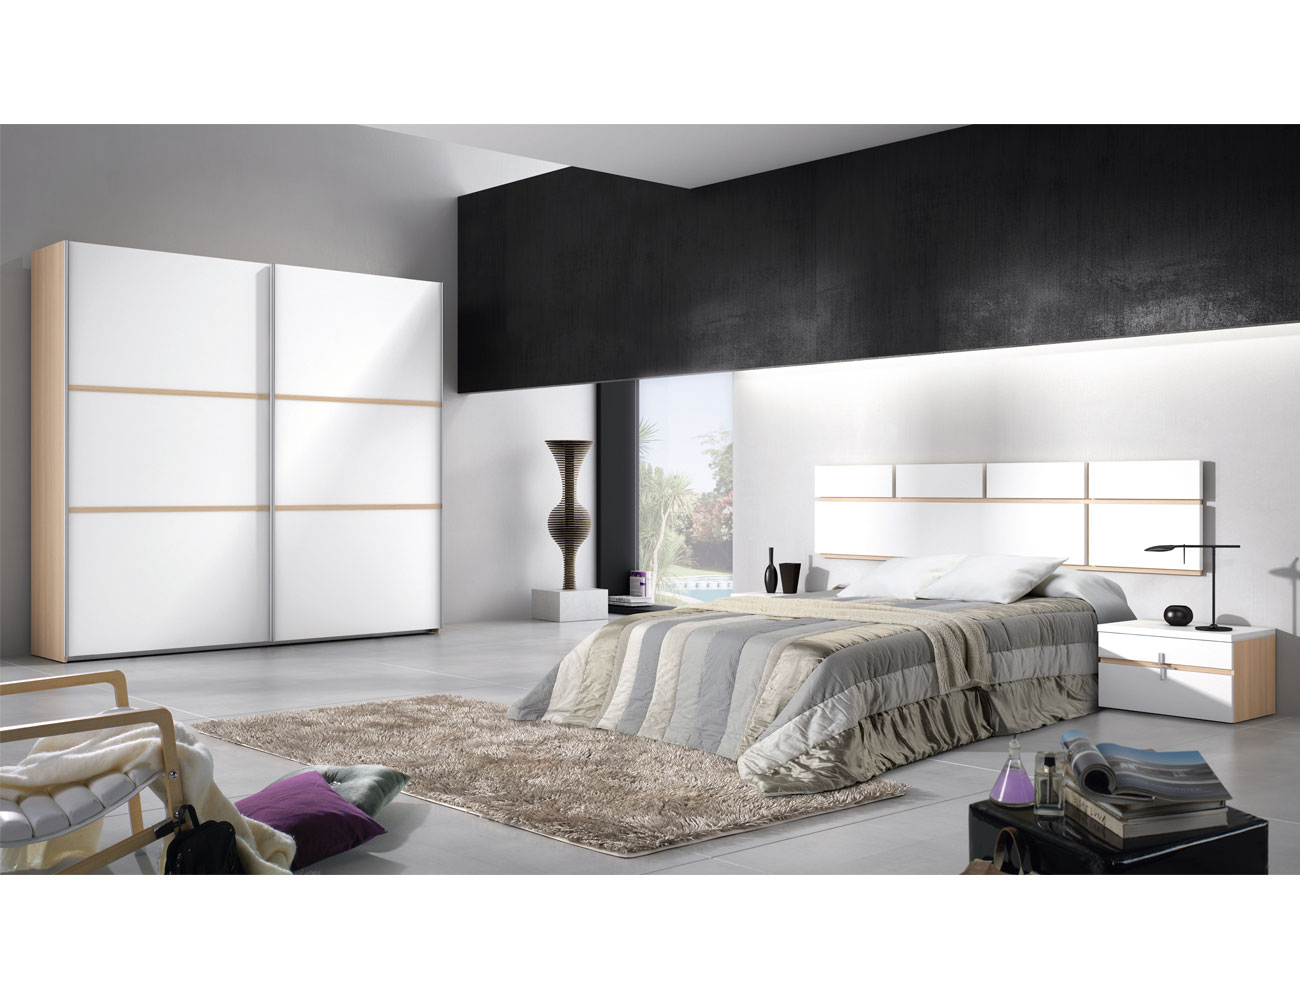 114 dormitorio matrimonio roble blanco armario